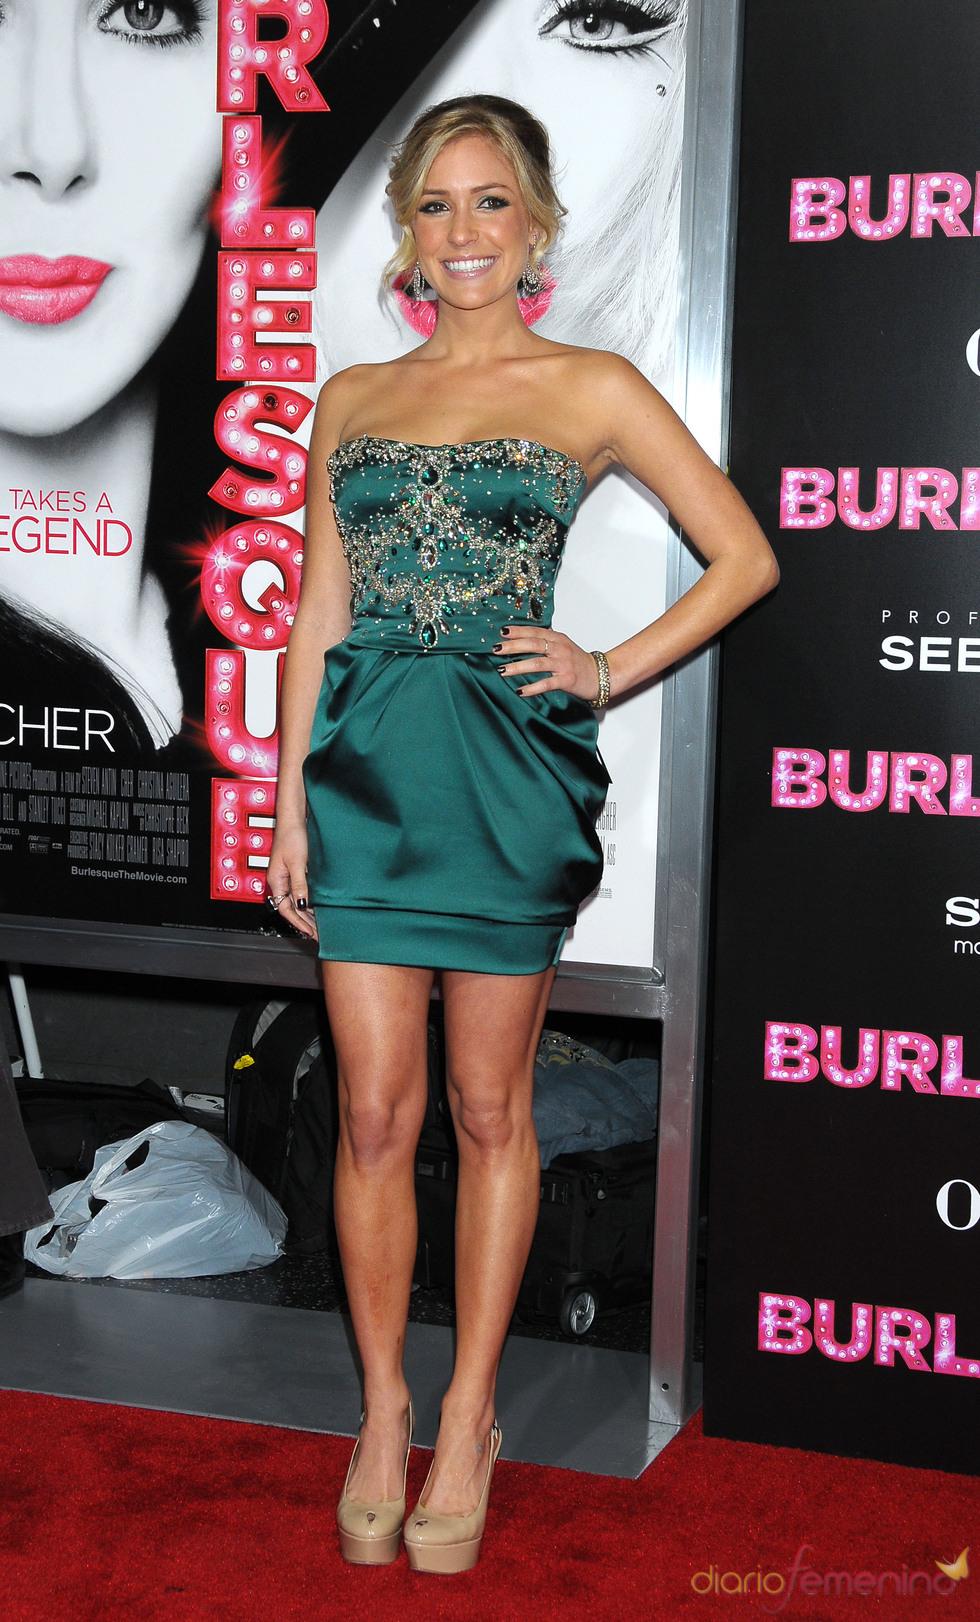 Kristin Cavallari en la premiere de 'Burlesque'